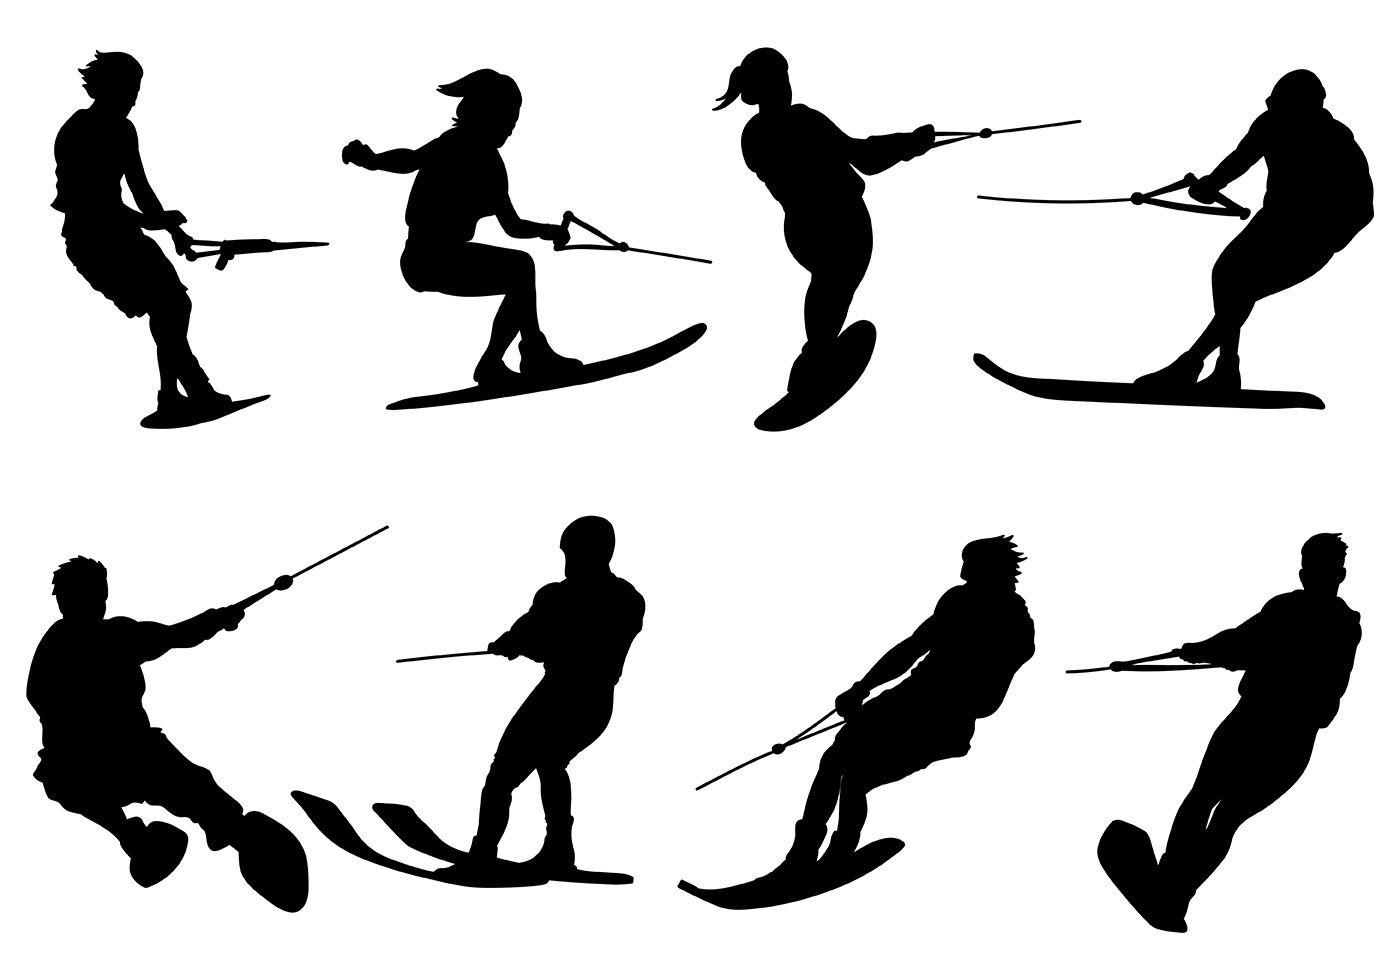 Free Water Skiing Icons Vector Jpg 1400 980 Slalom Water Skiing Water Skiing Slalom Skiing